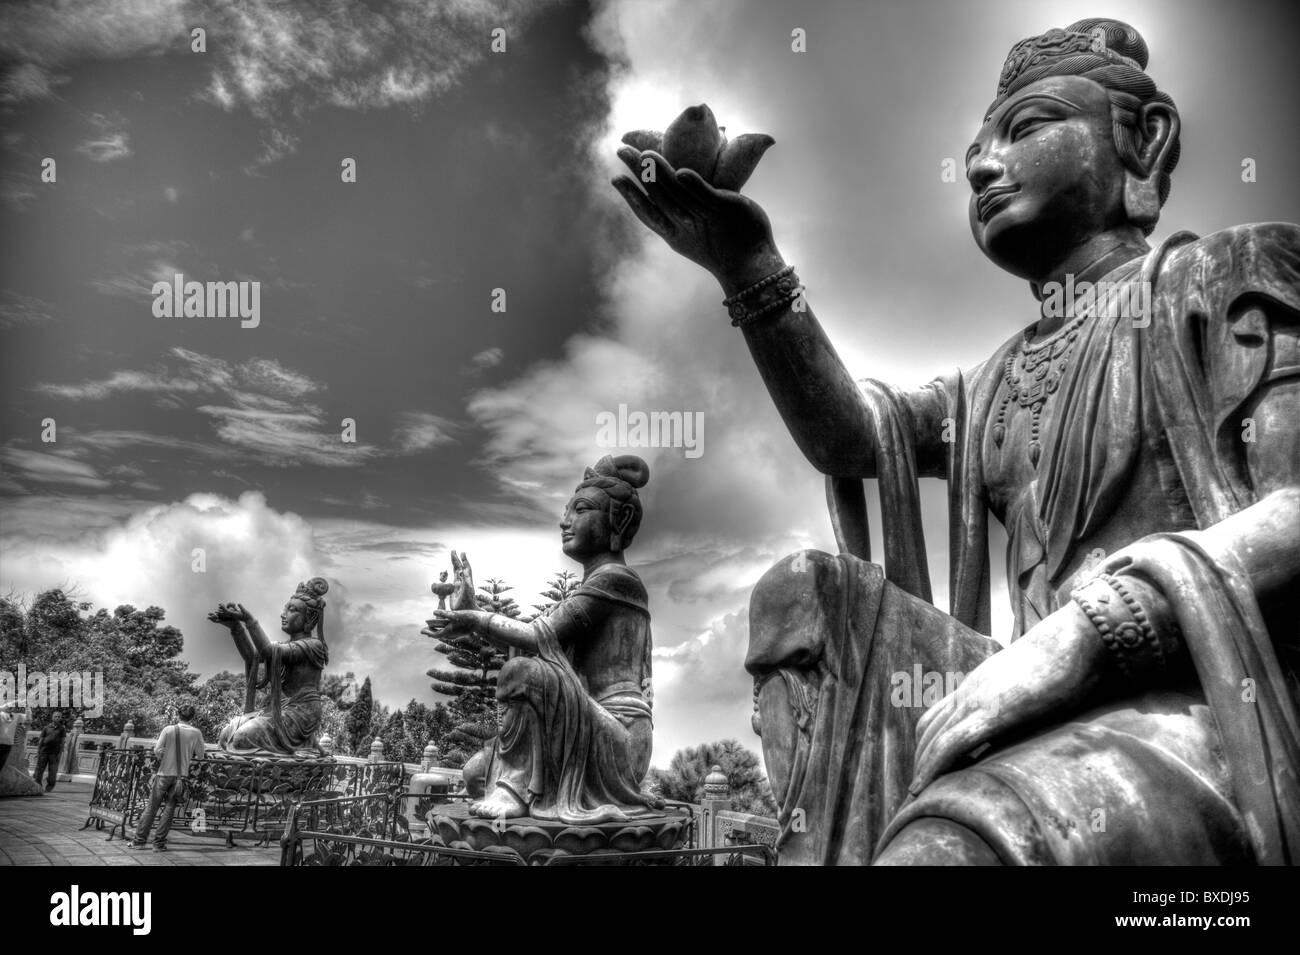 Hong Kong, Lantau island seated bronze statues making offerings to  Buddha, - Stock Image